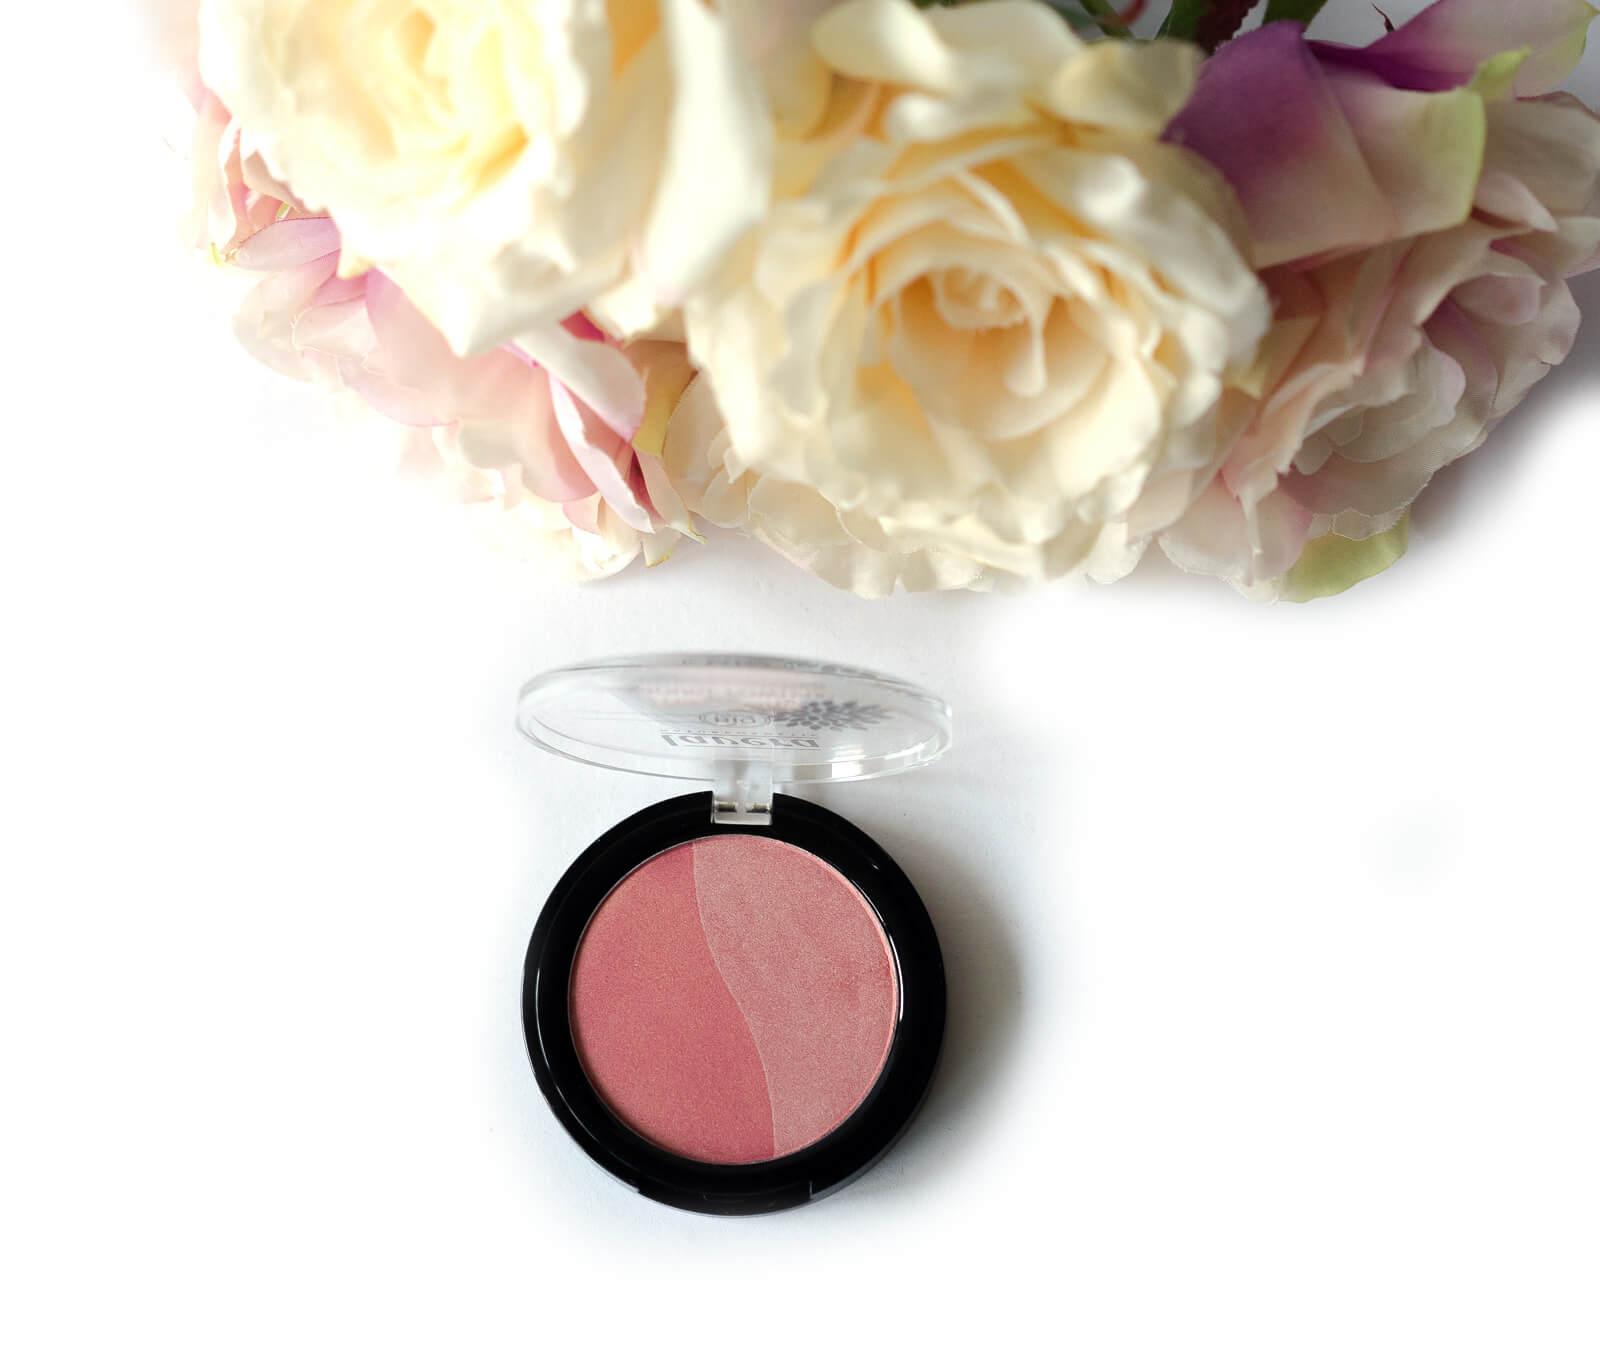 LaveraRouge So Fresh Mineral Rouge Powder